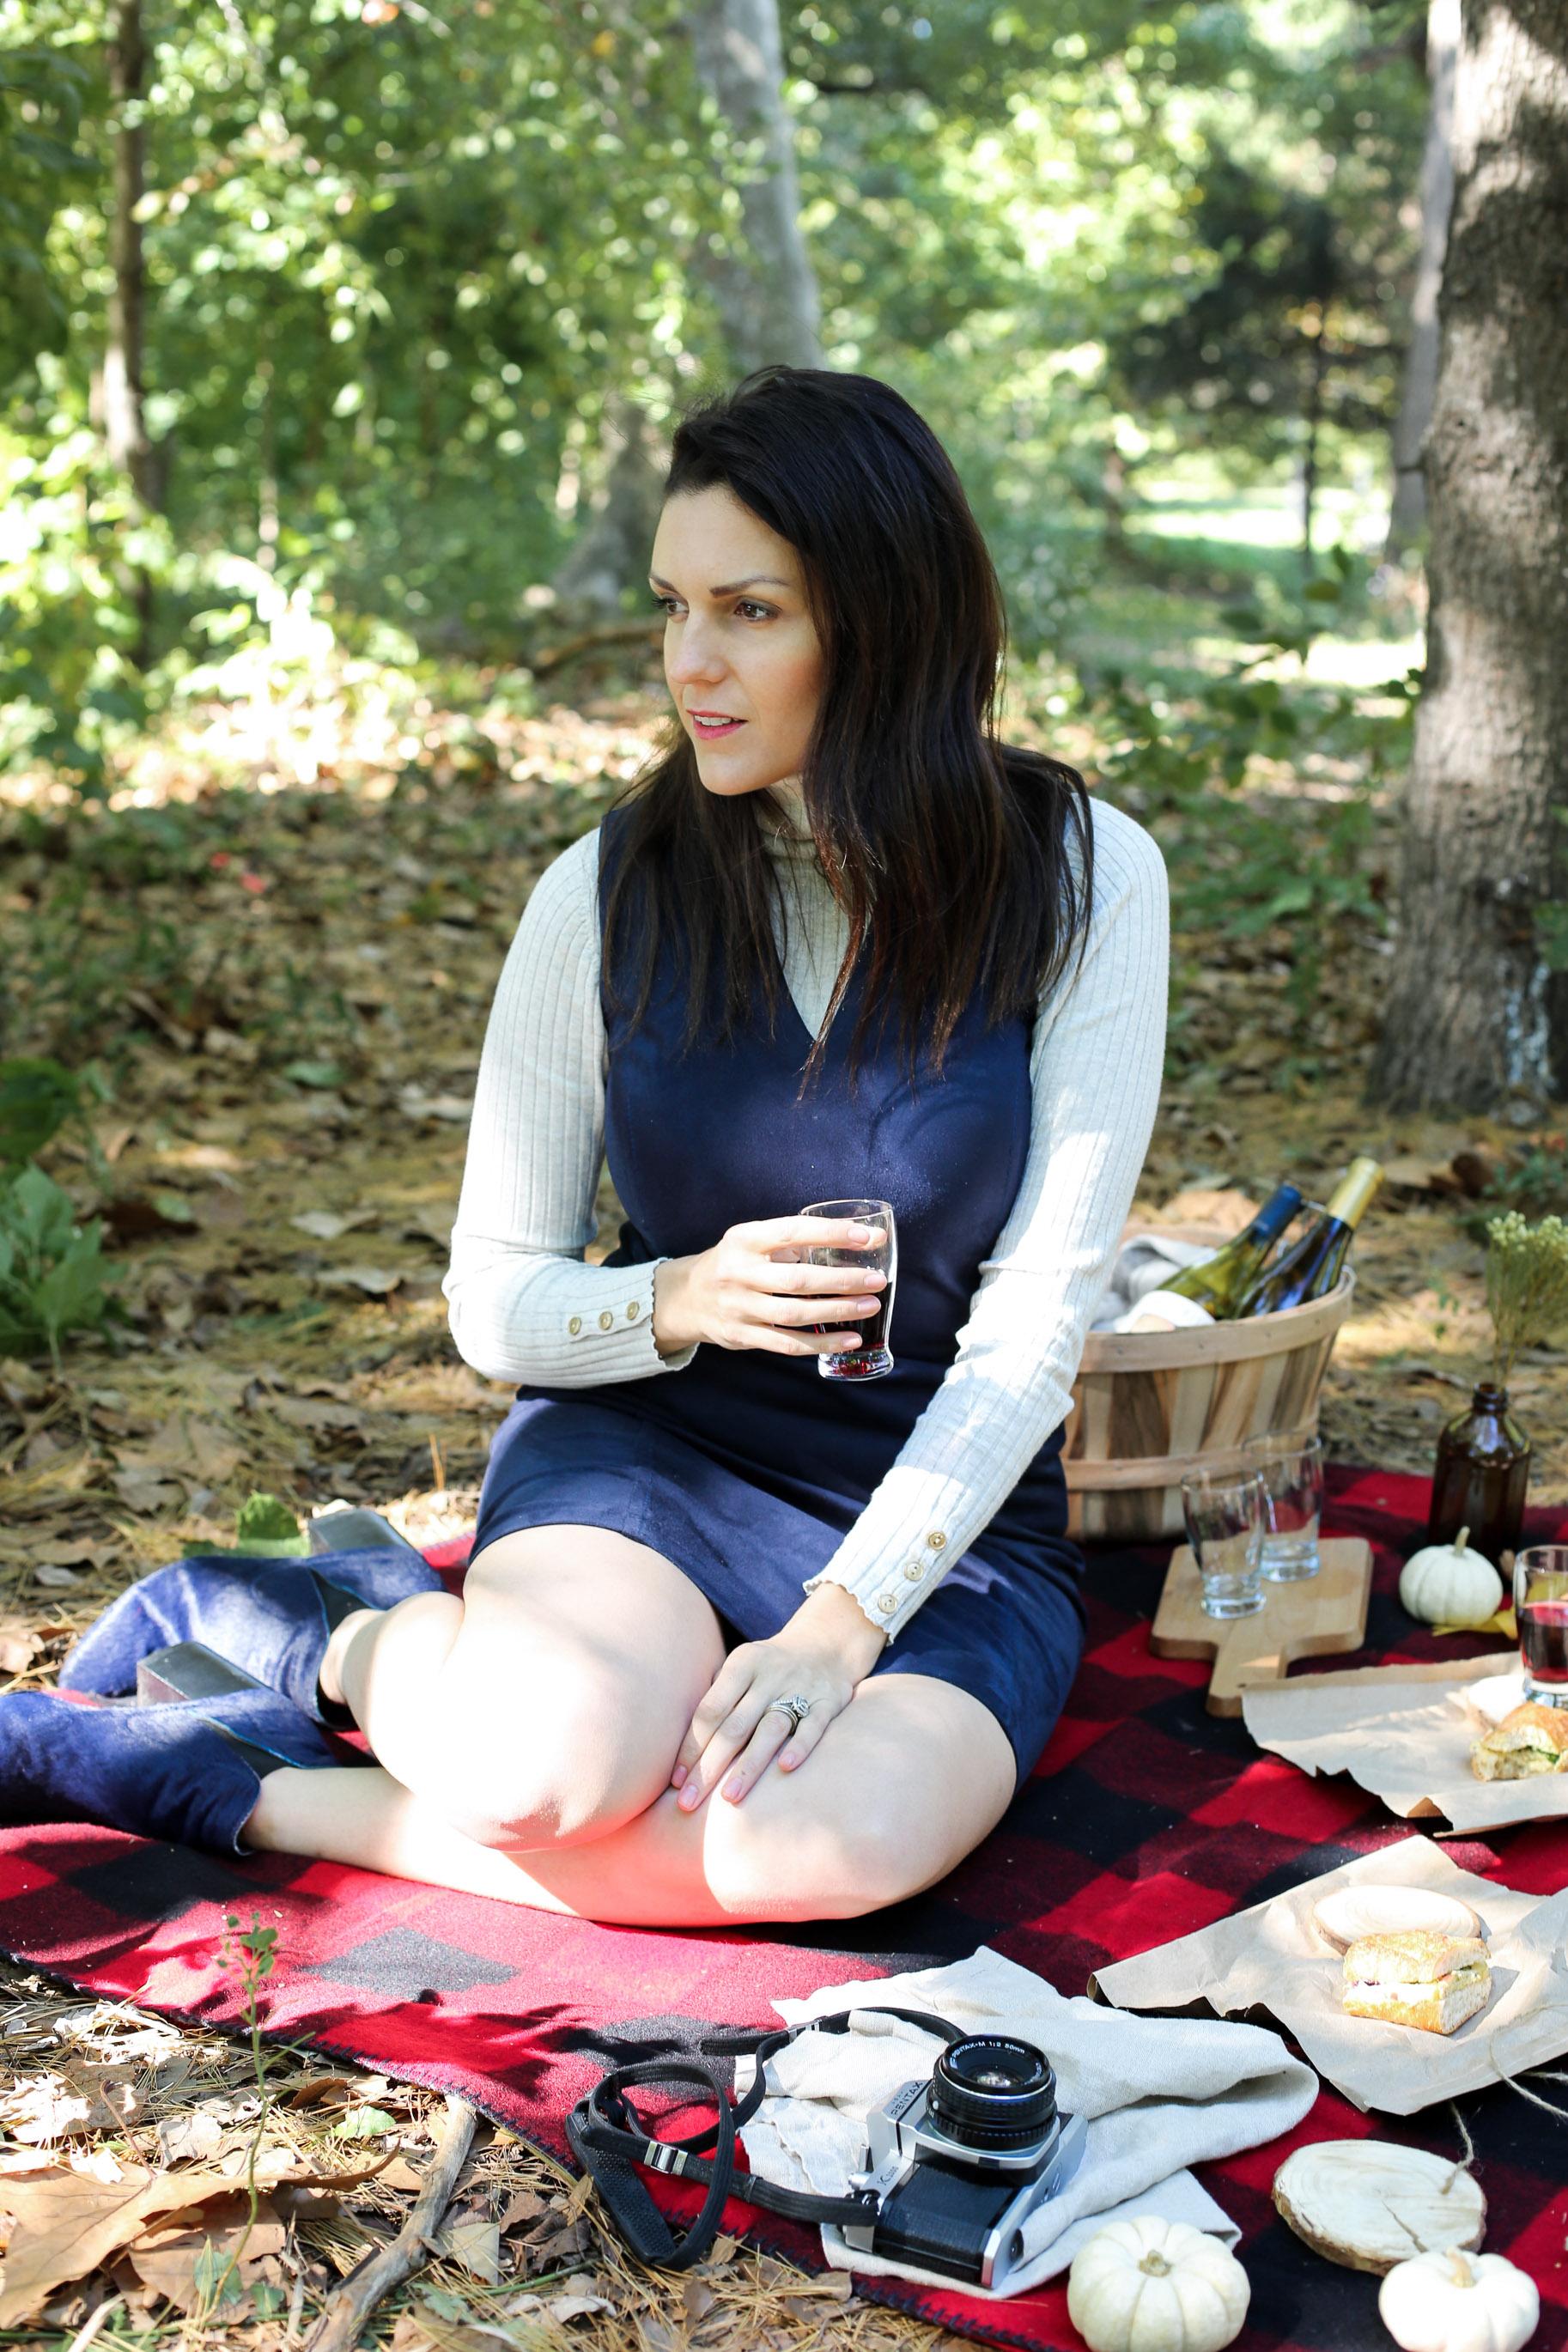 Fall-Wine-Tasting-Picnic11.jpg